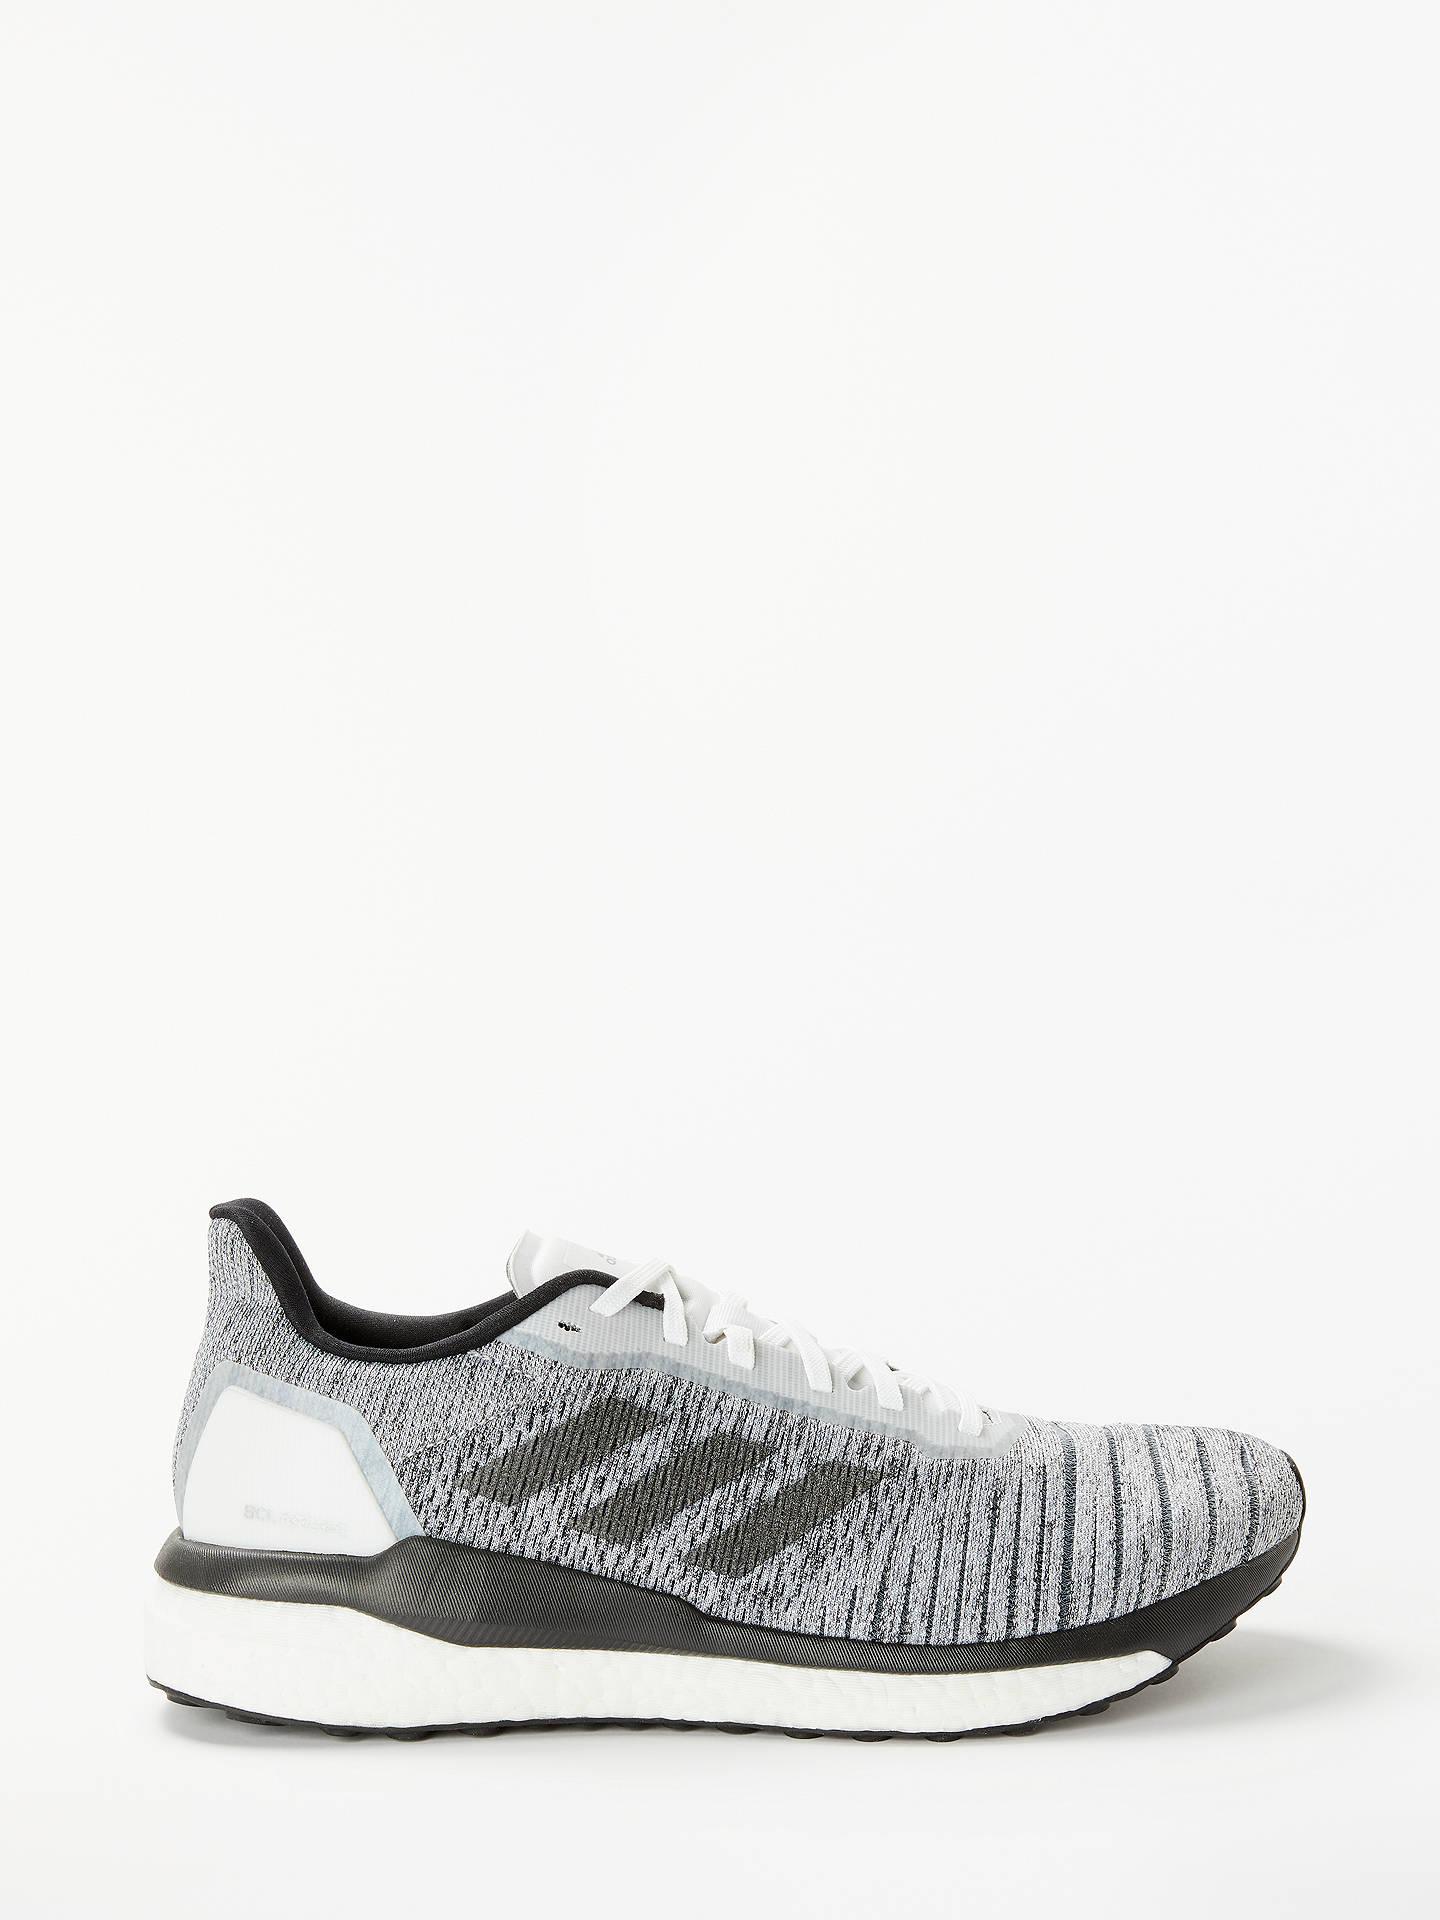 artesanía exquisita presentación 60% barato Adidas Men's Running Shoes   Mens Solar Drive Shoes D97442